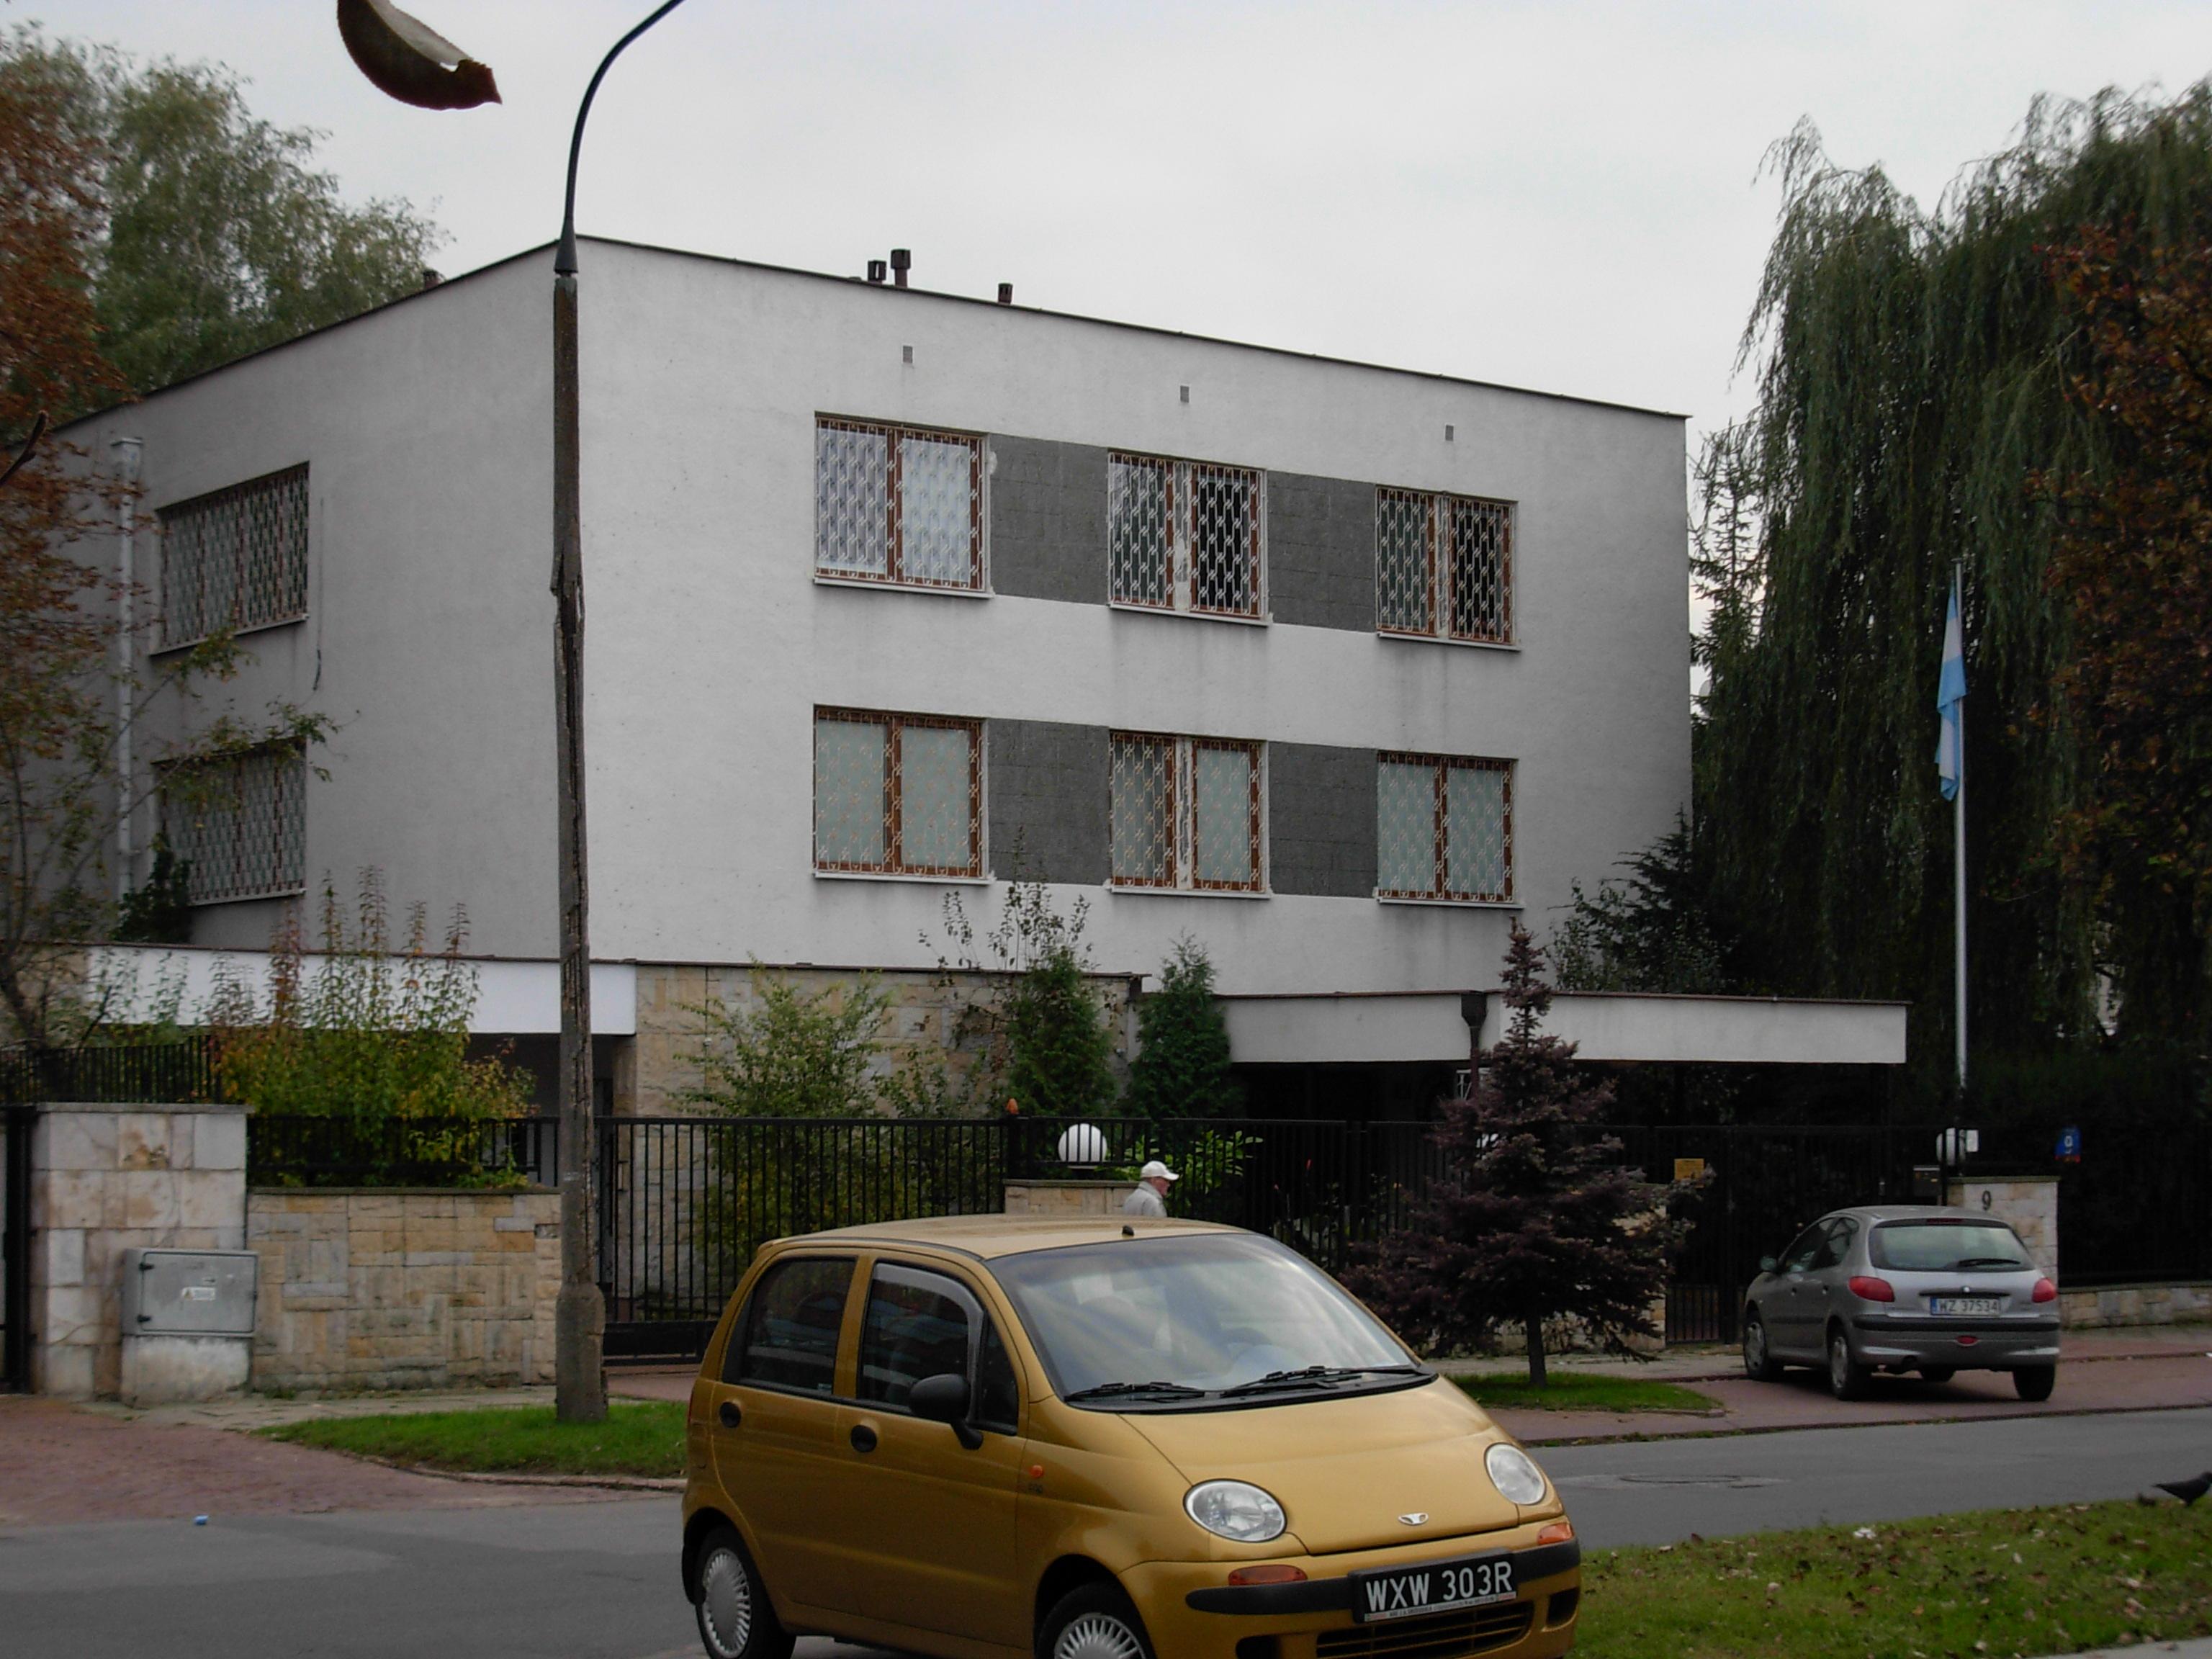 le Consulat Gnral de Russie a Hambourg, Allemagne